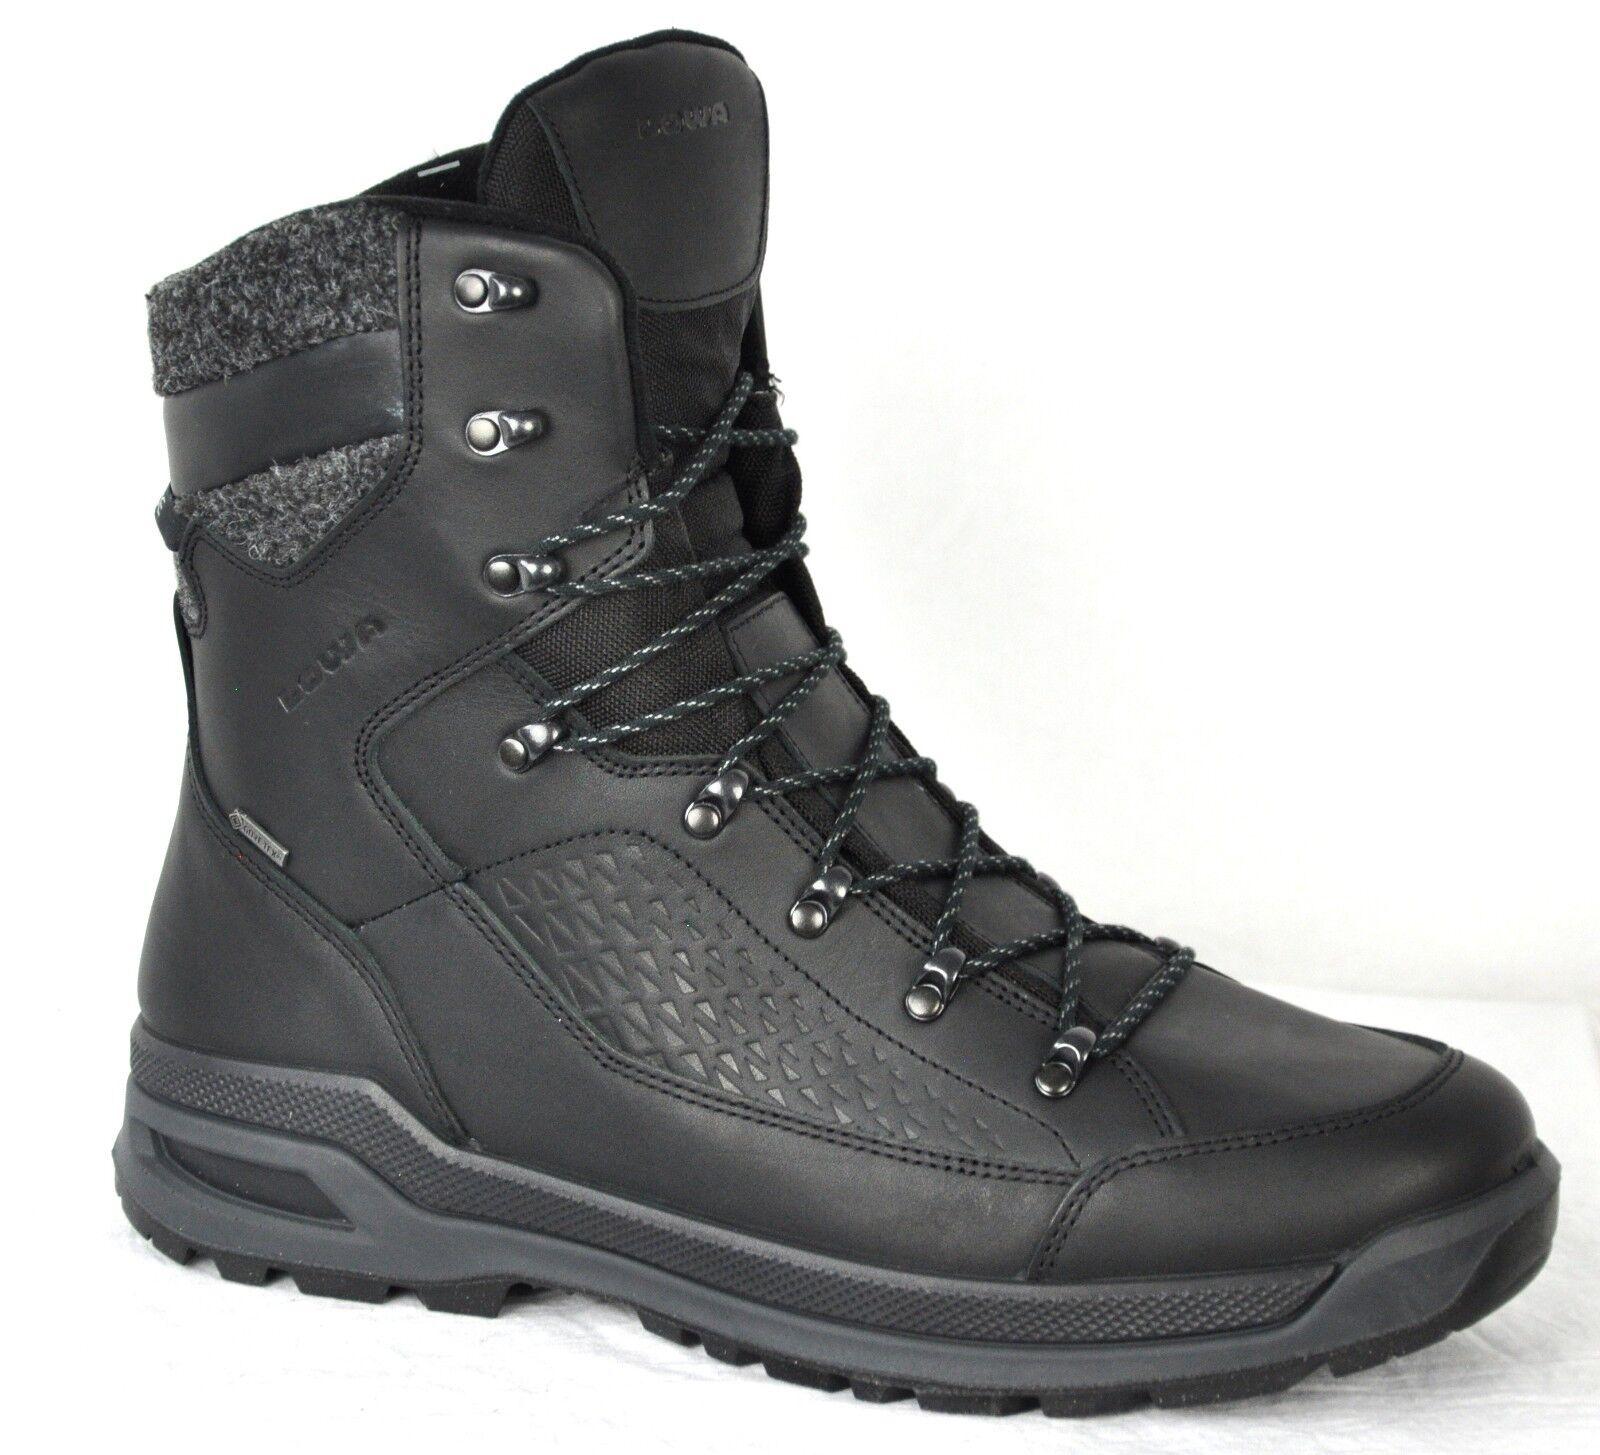 Lowa Mens Renegade Evo Ice Gore-Tex Winter Boots 410950 0999 Black Size 10.5